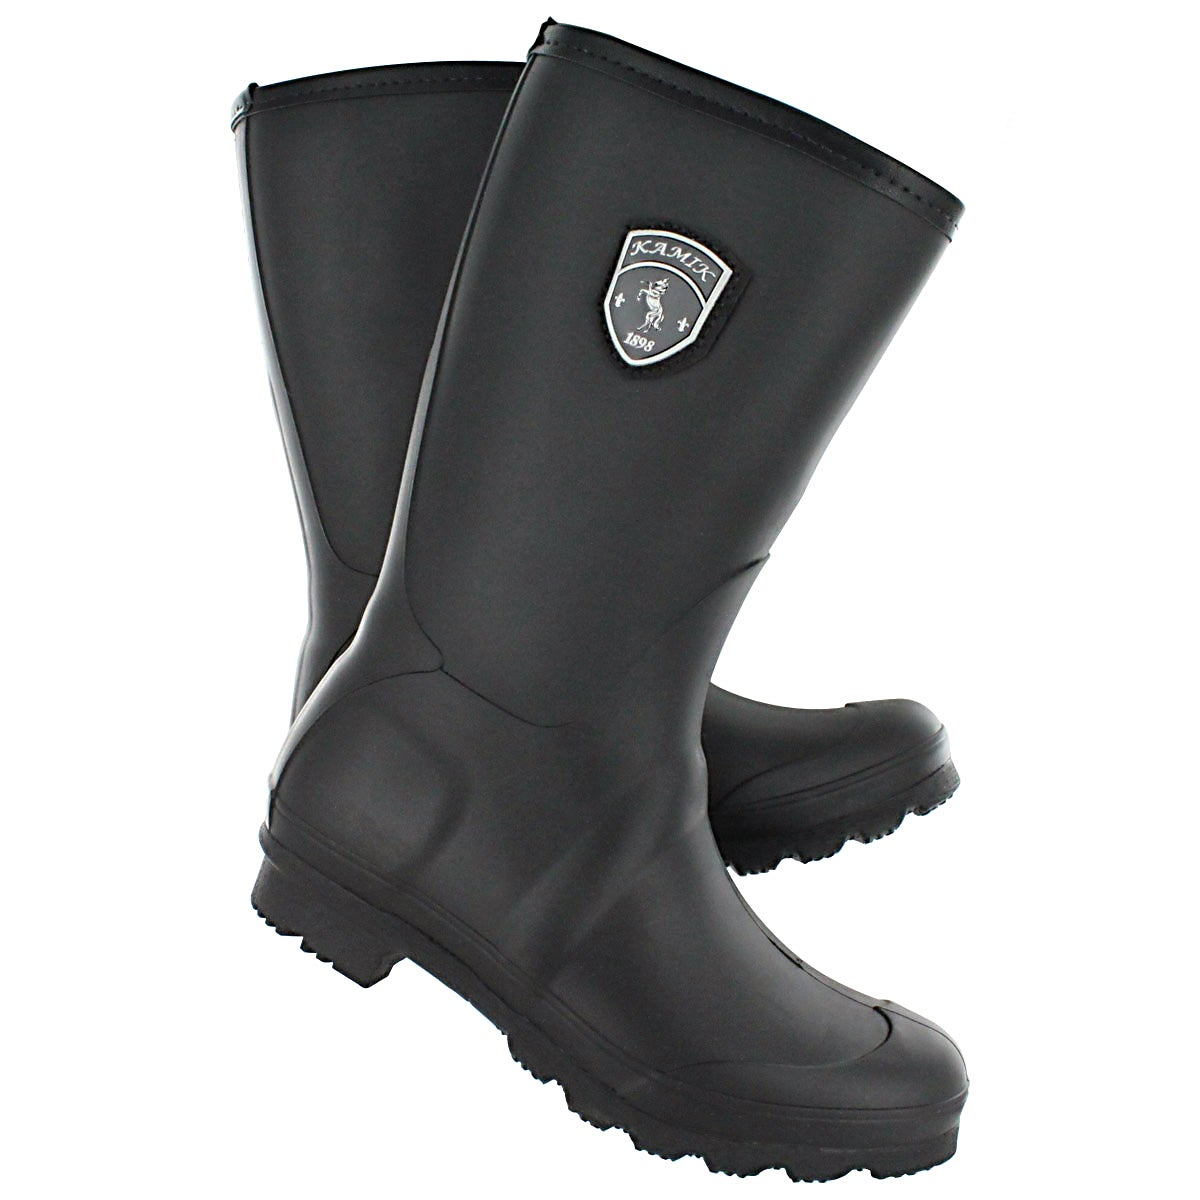 Lds Jenny blk mid rain boot